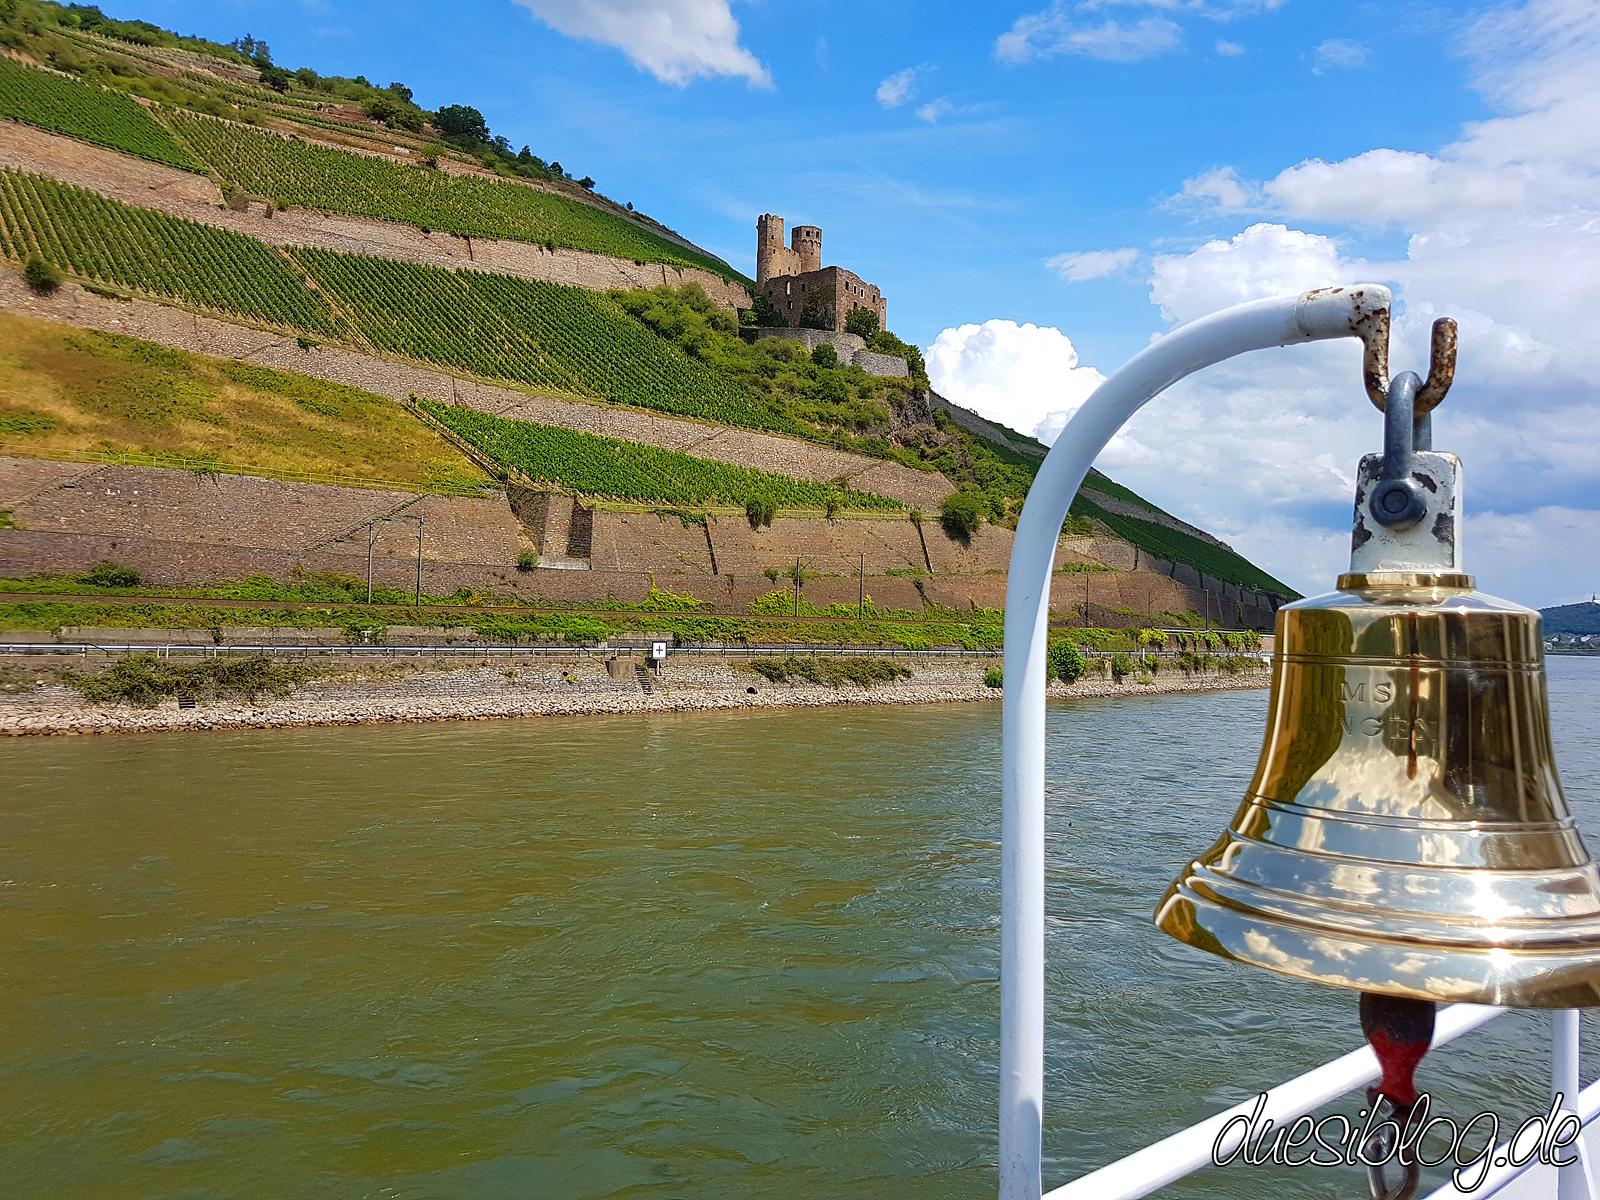 Ruedesheim Rheingau Travelblog duesiblog 149